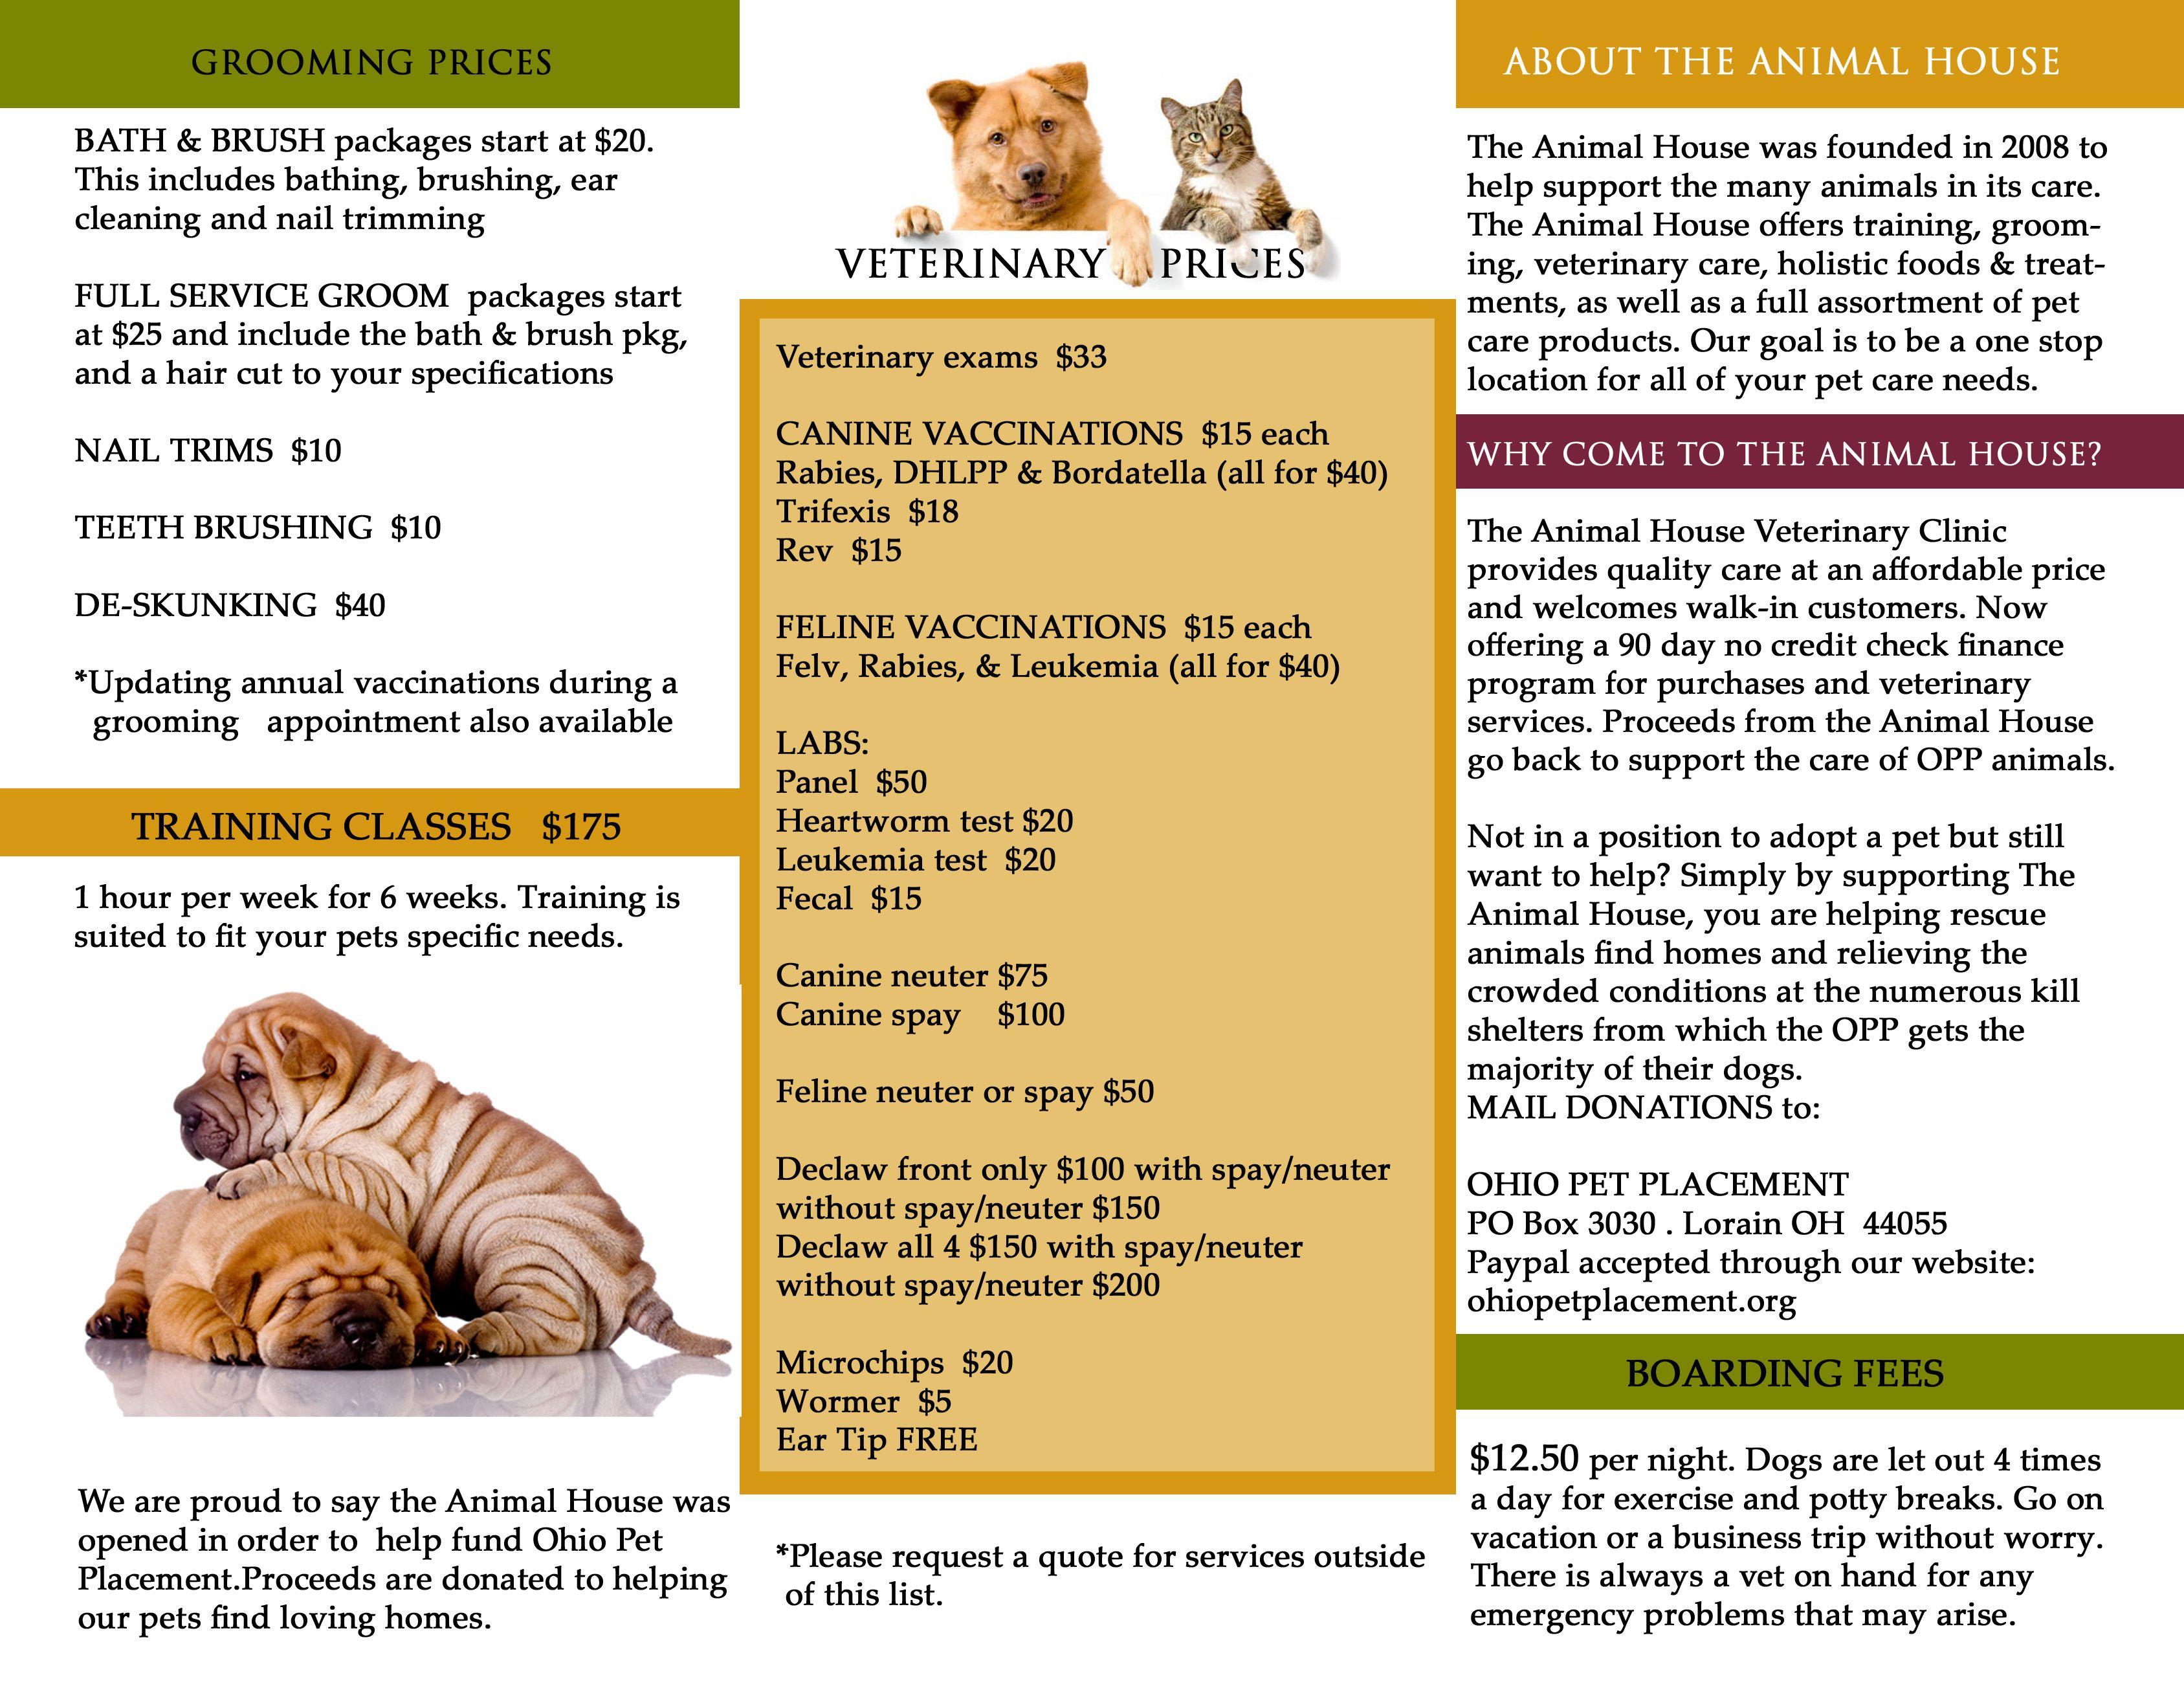 Tri Fold Brochure Inside Holistic Recipes Veterinary Care Bath Brushes